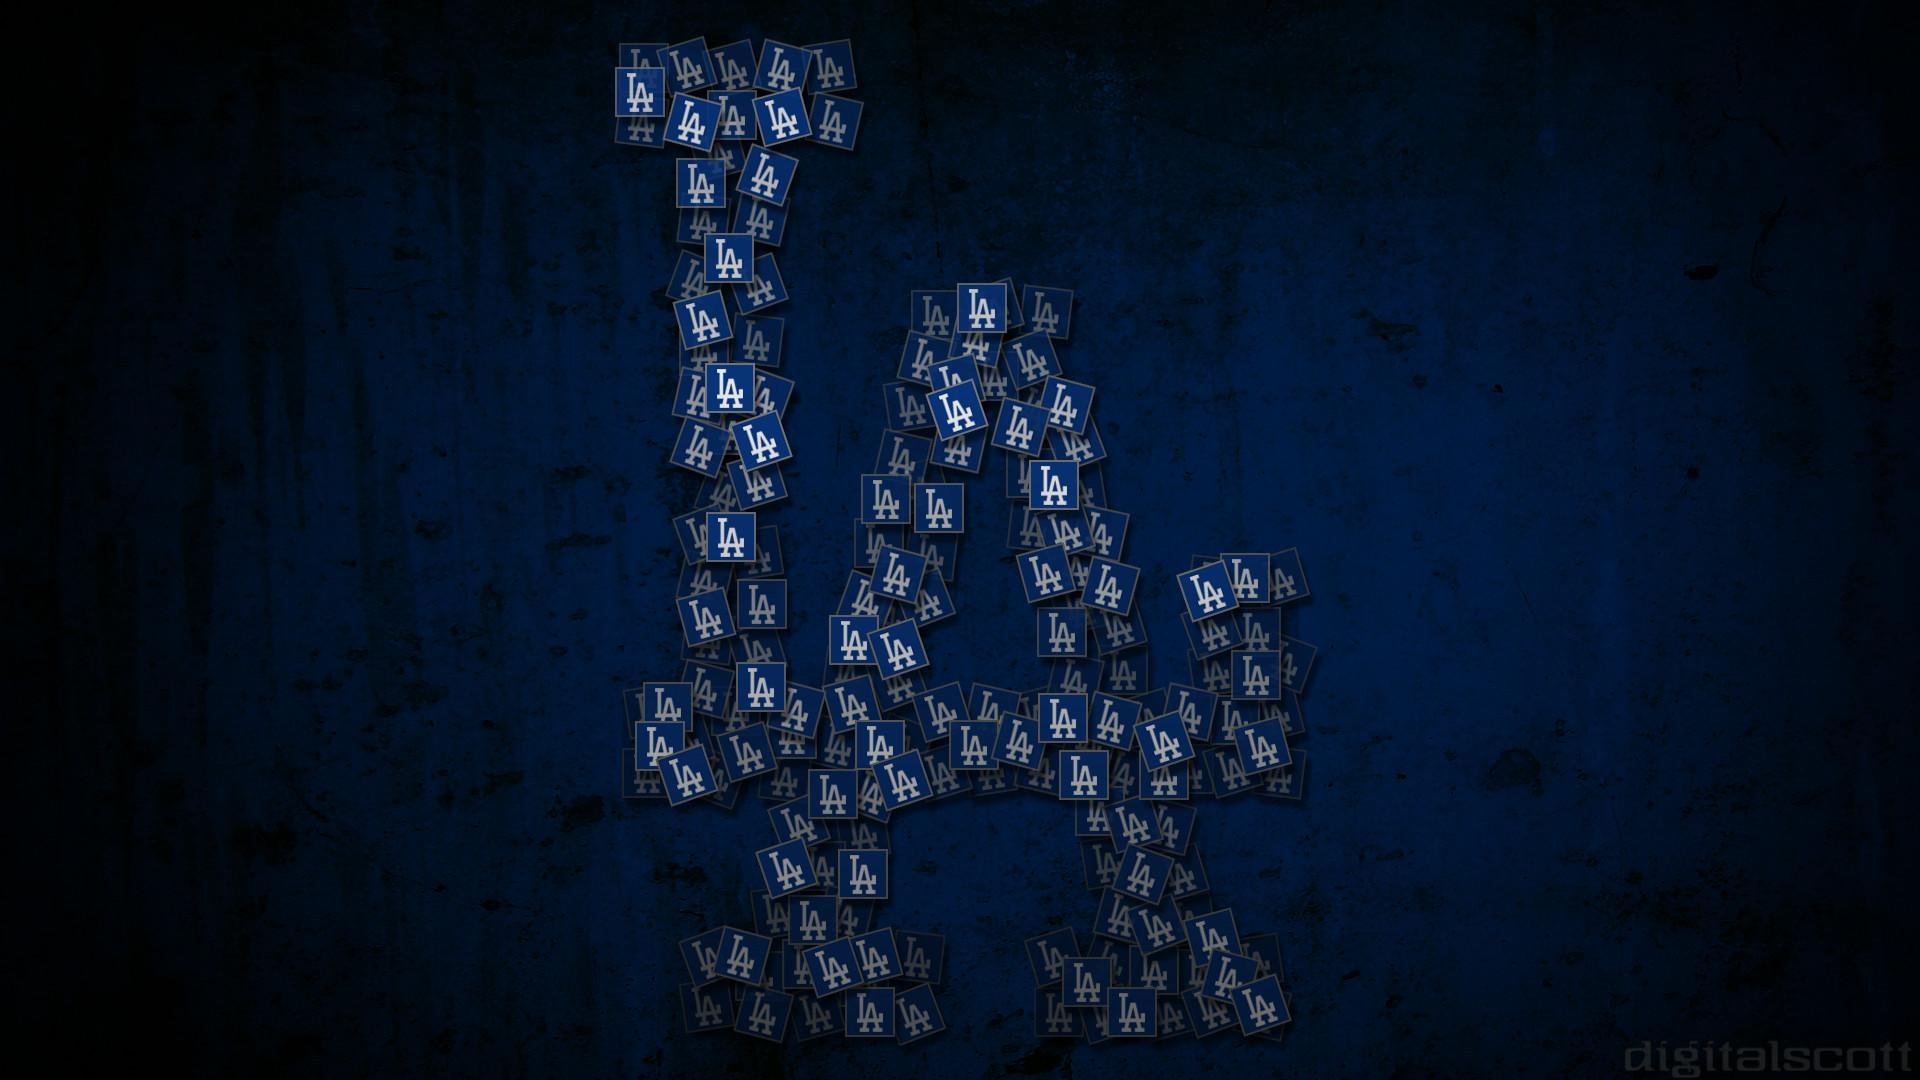 Dodgers stadium wallpaper 2048x1536 altavistaventures Image collections